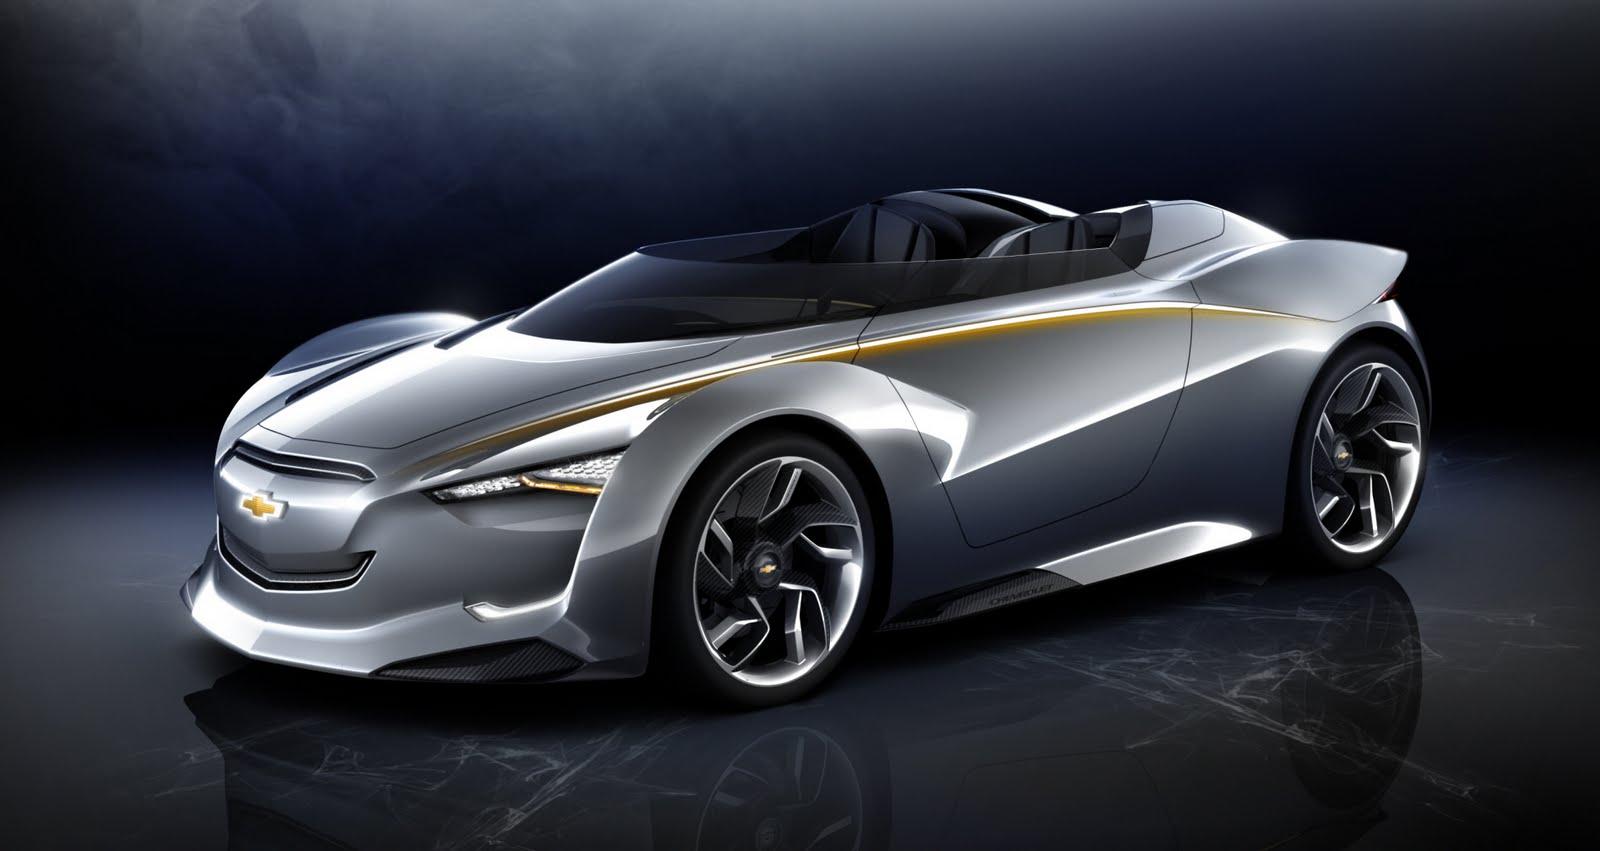 Seoul Motor Show 2011, Chevrolet Mi-ray Roadster Concept